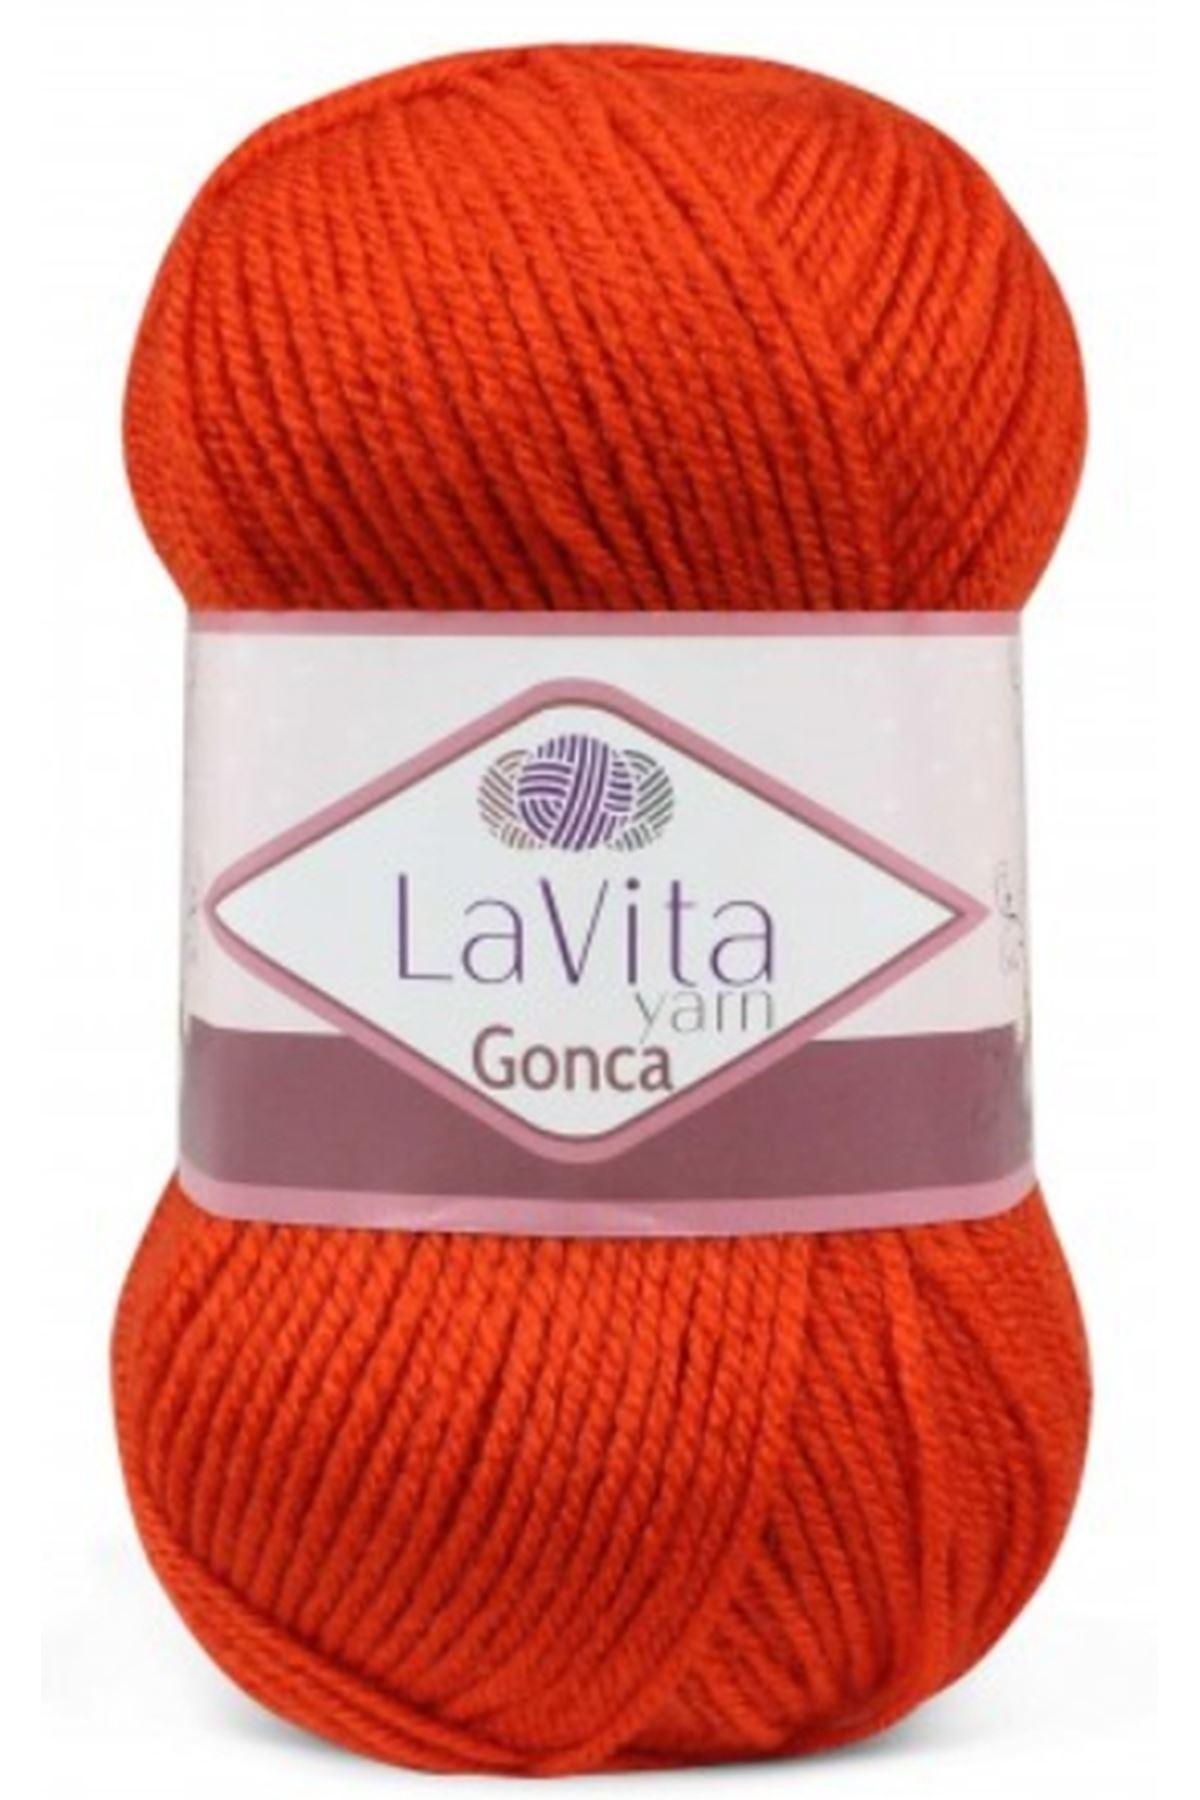 Lavita Gonca 3016 Turuncu